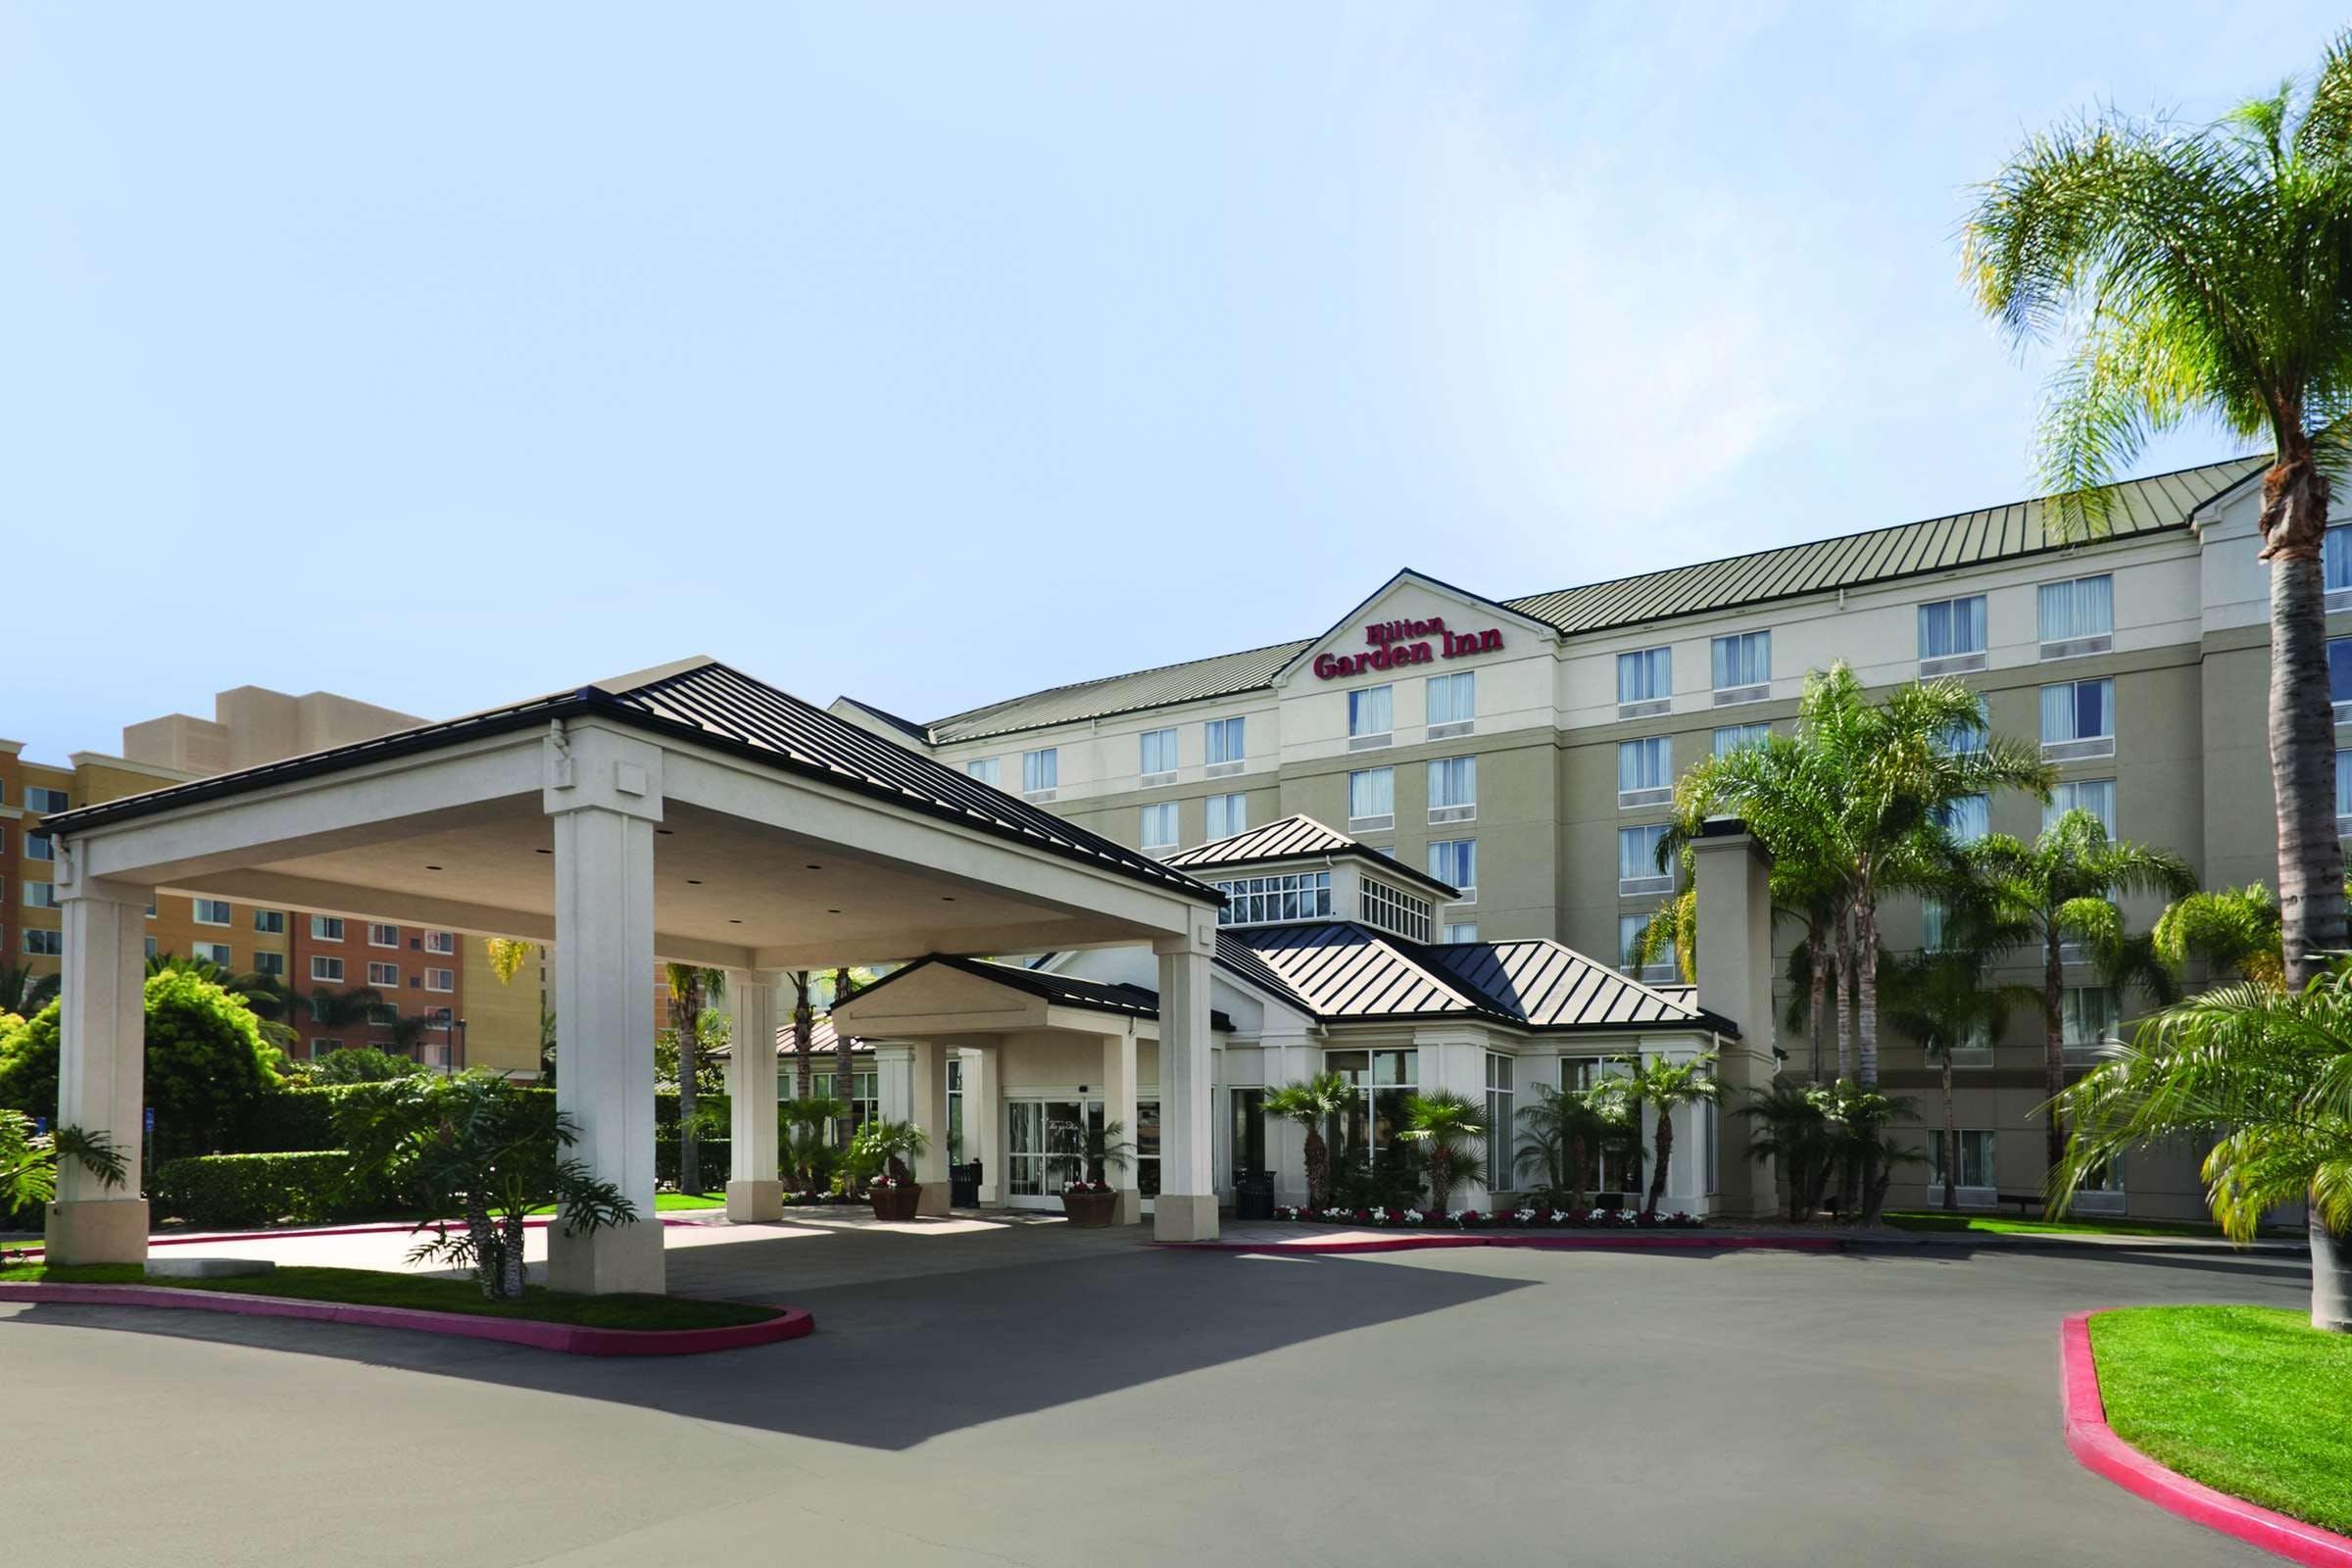 Hilton Garden Inn Anaheim Garden Grove